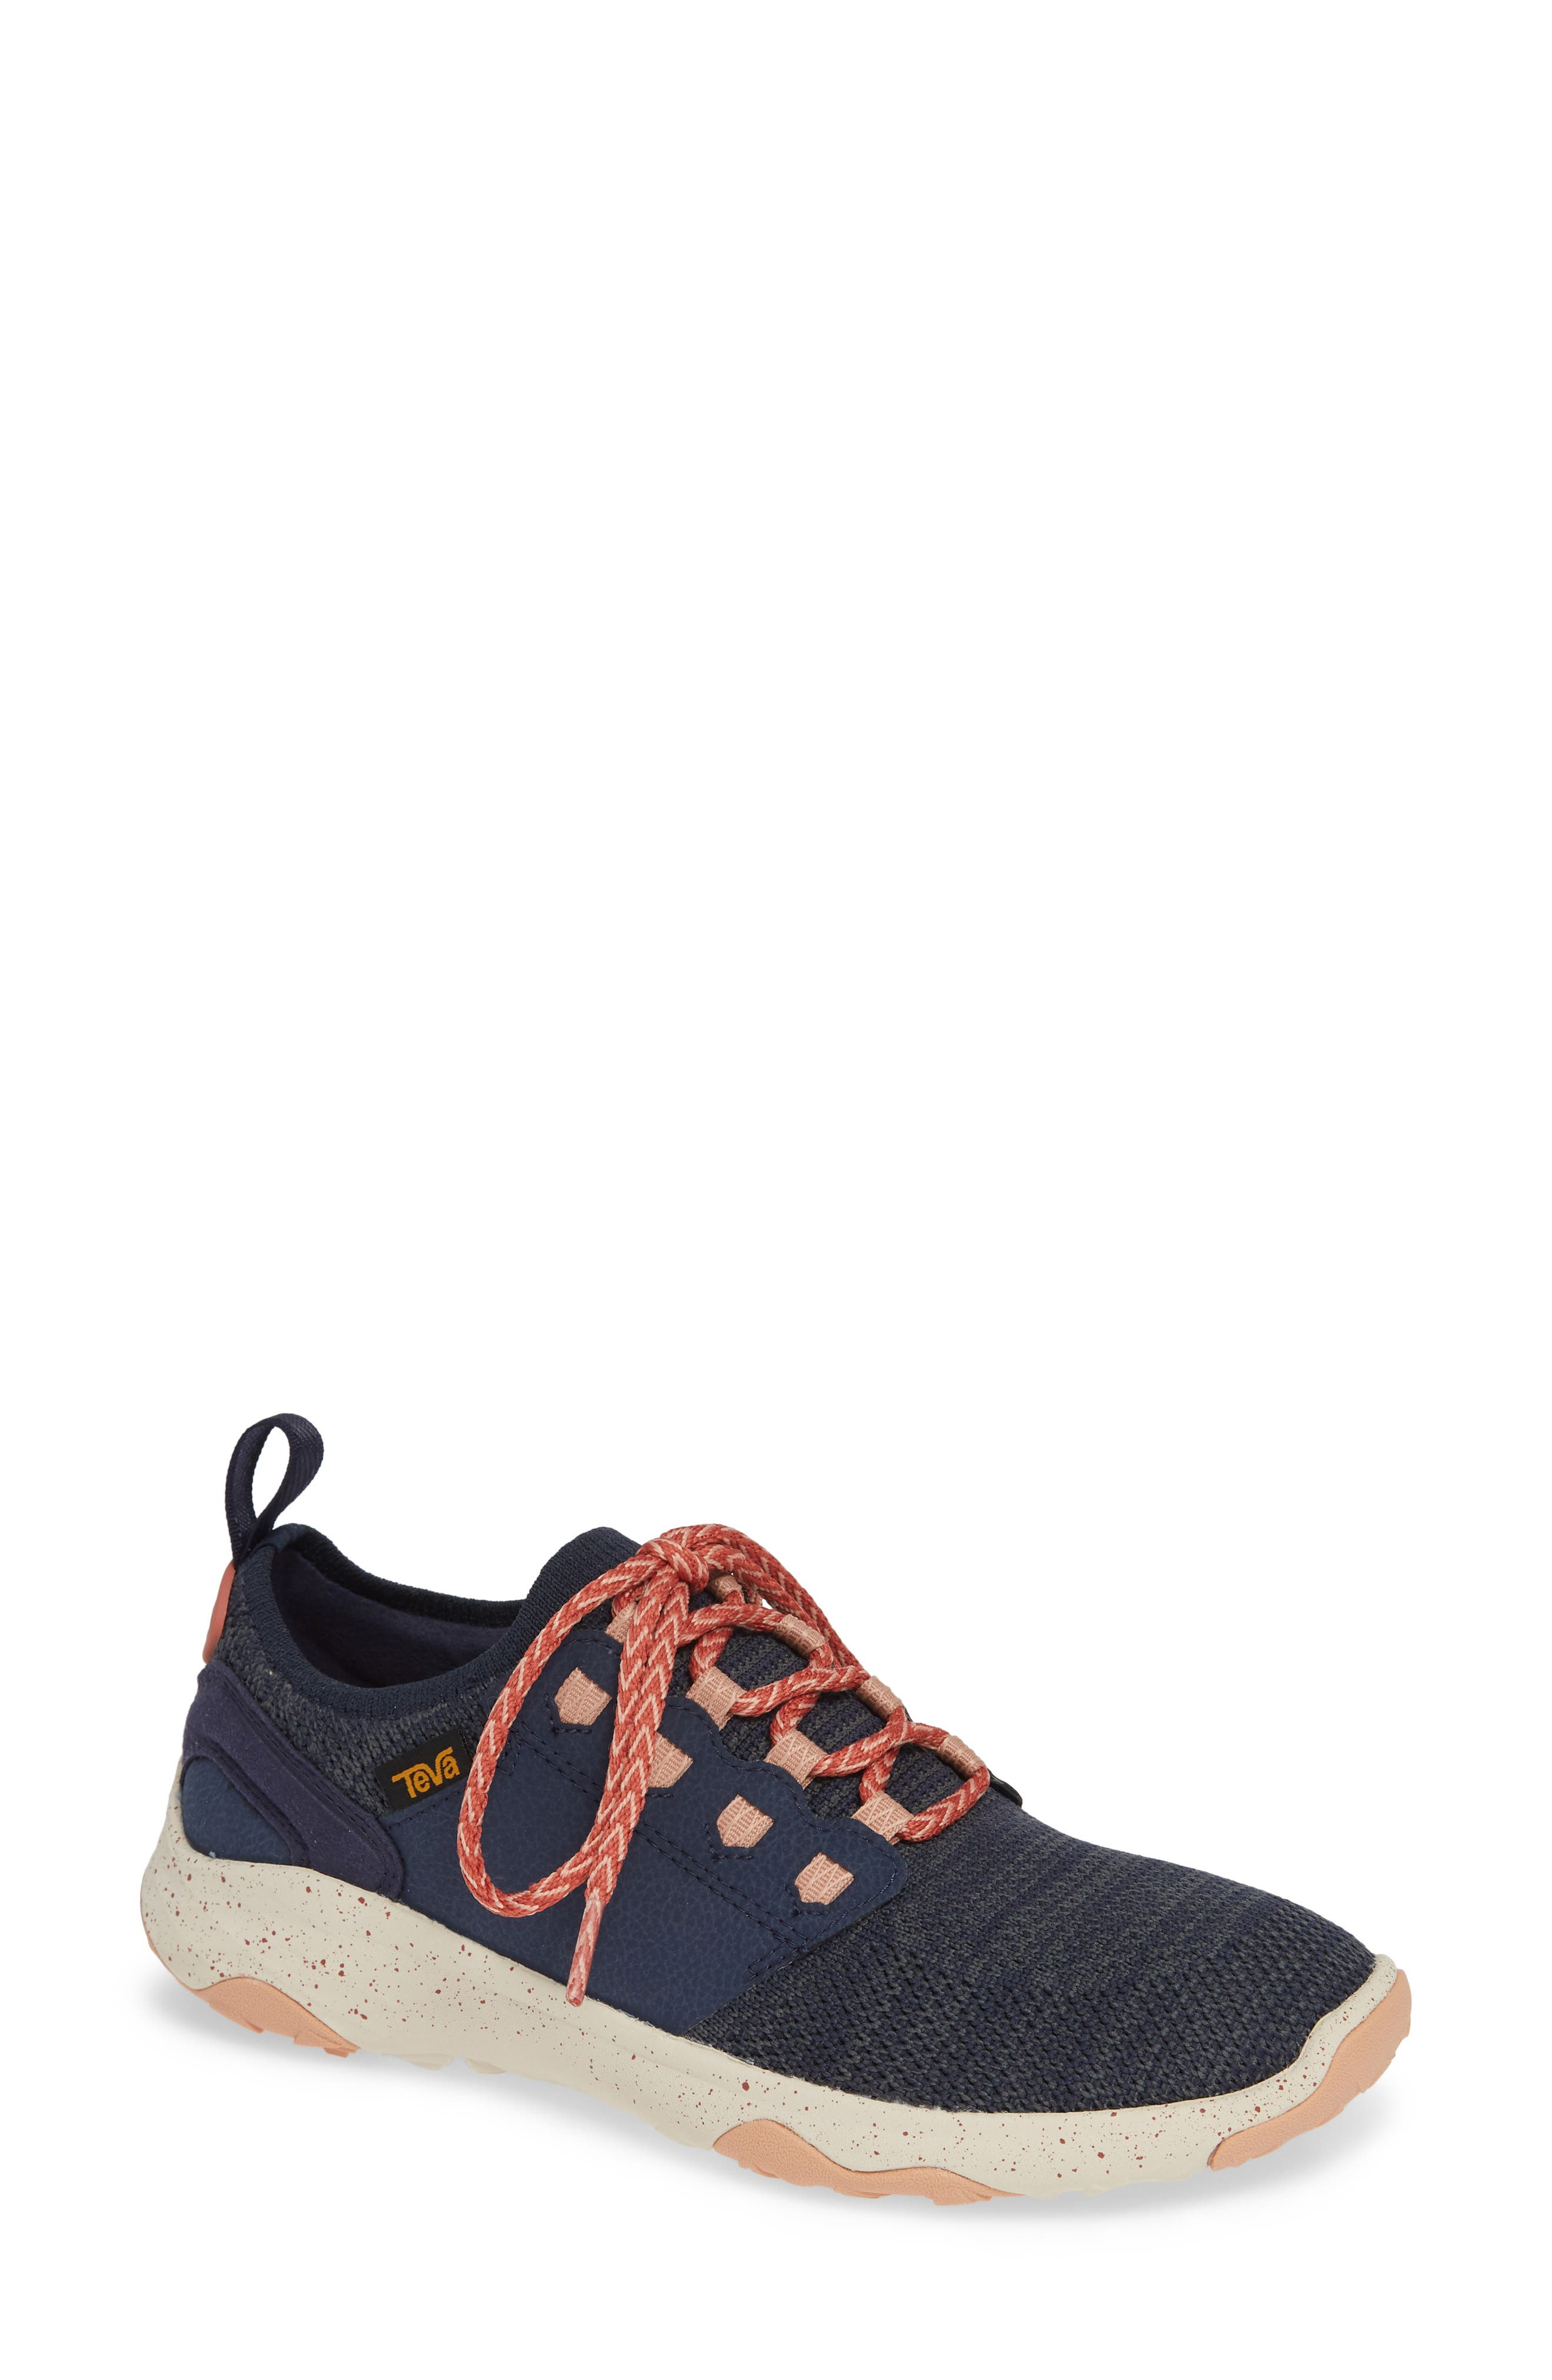 TEVA Arrowood 2 Waterproof Knit Sneaker in Midnight Navy Fabric